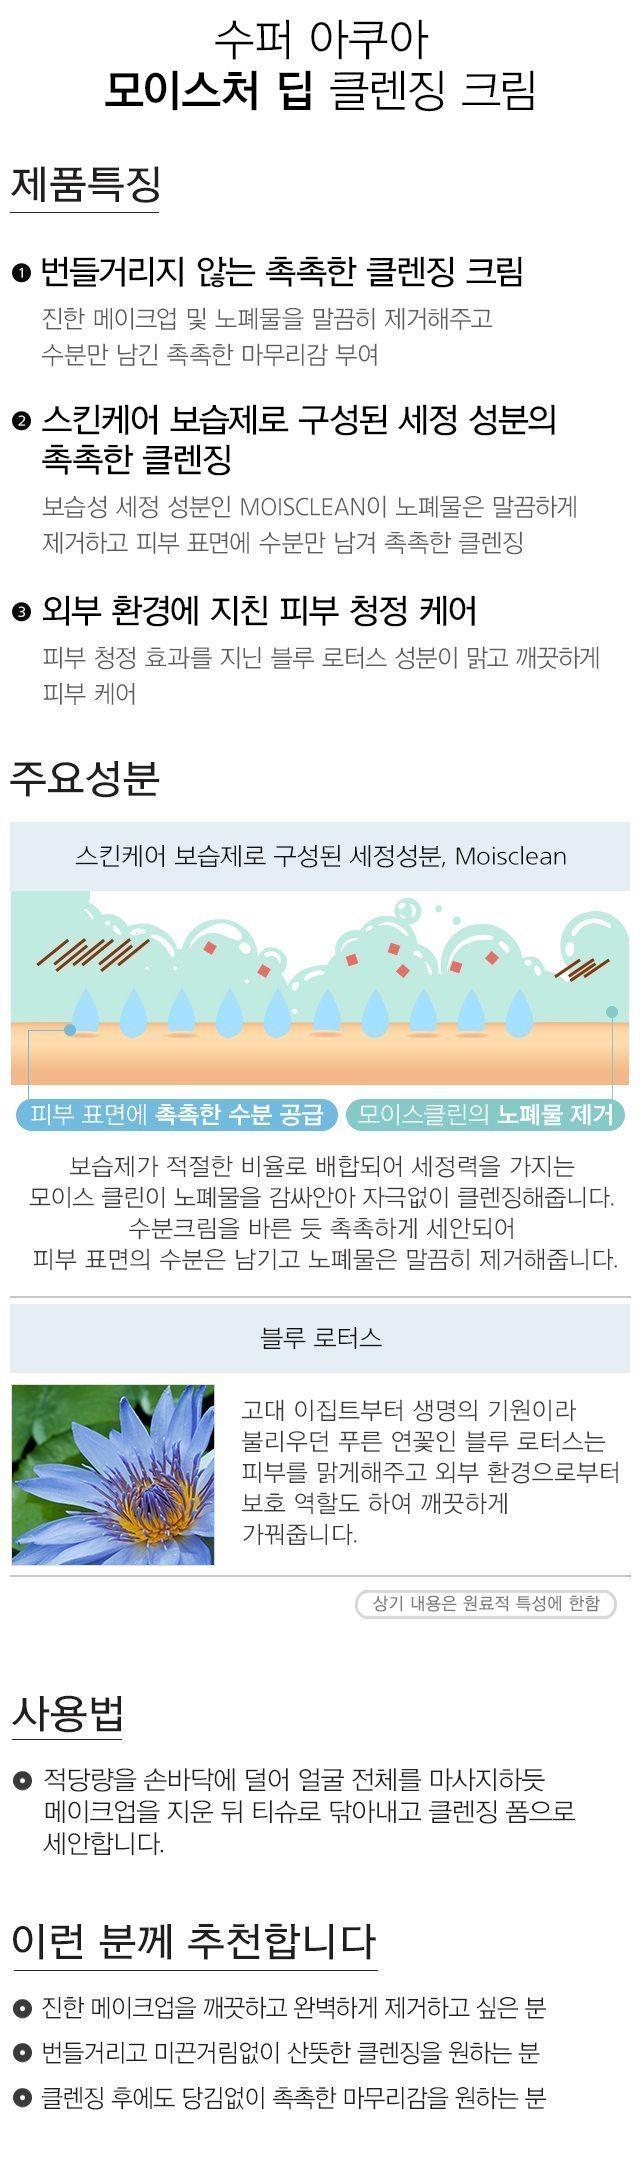 Missha Super Aqua Moisture Deep Cleansing Cream Korean